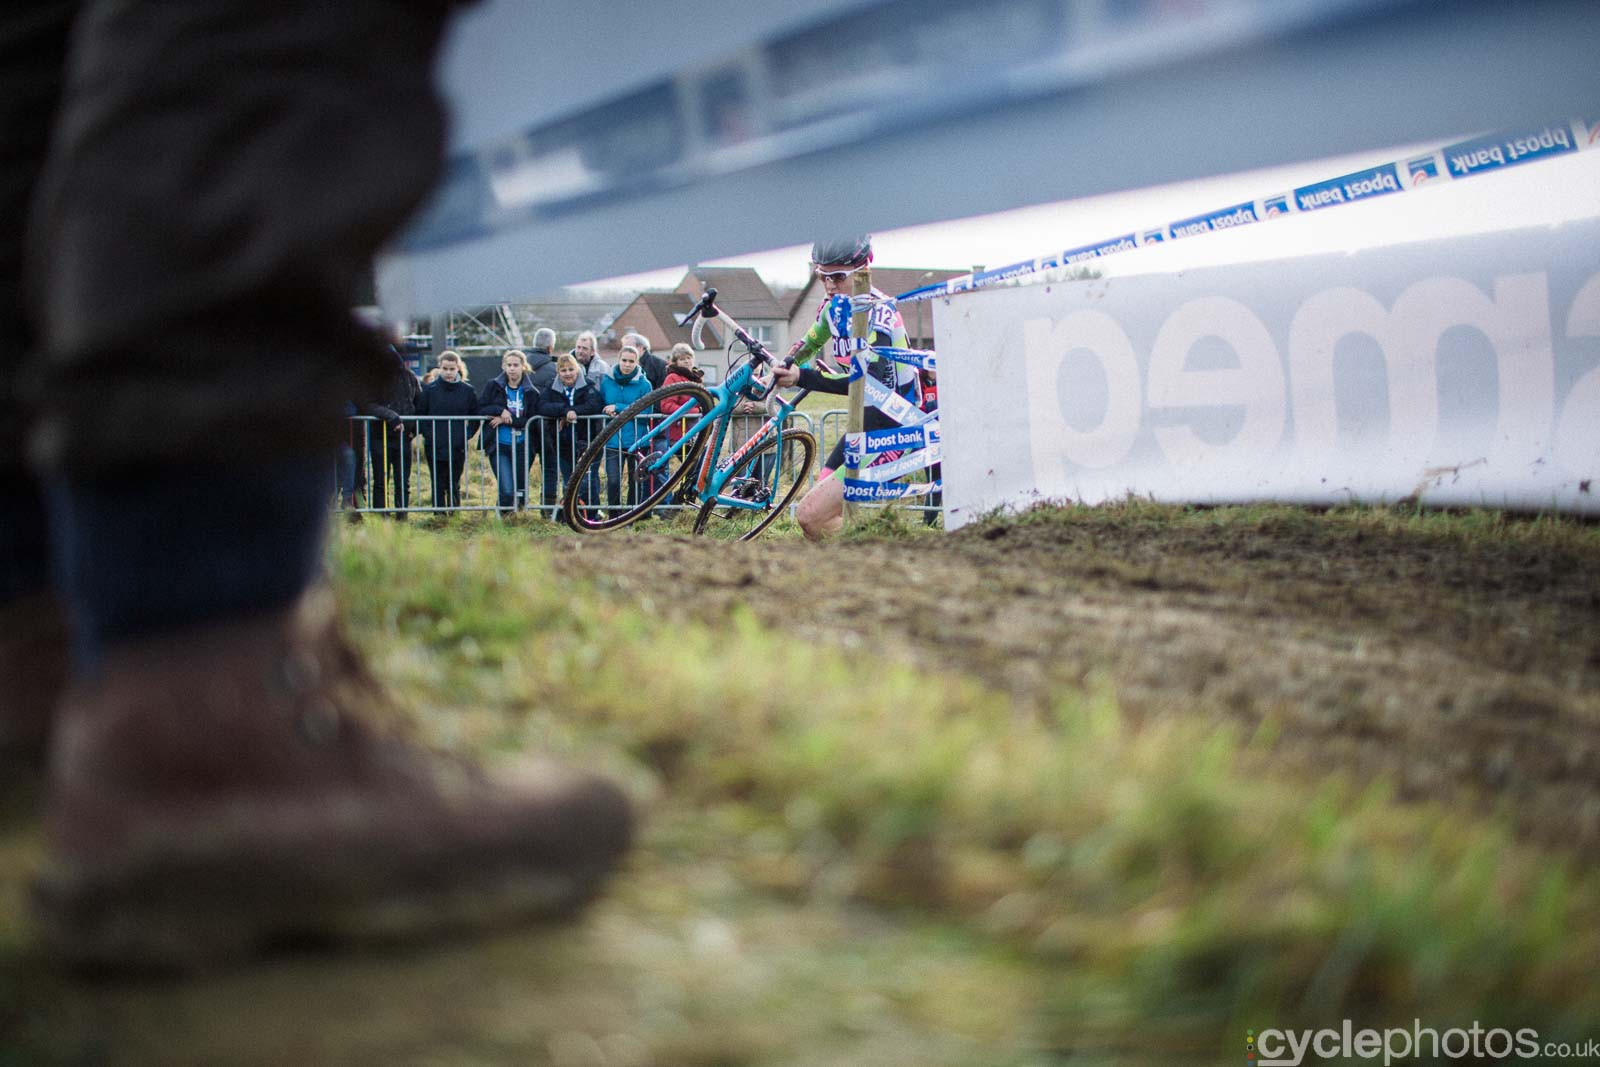 2016-cyclephotos-cyclocross-gpsvennys-140426-delia-beddis